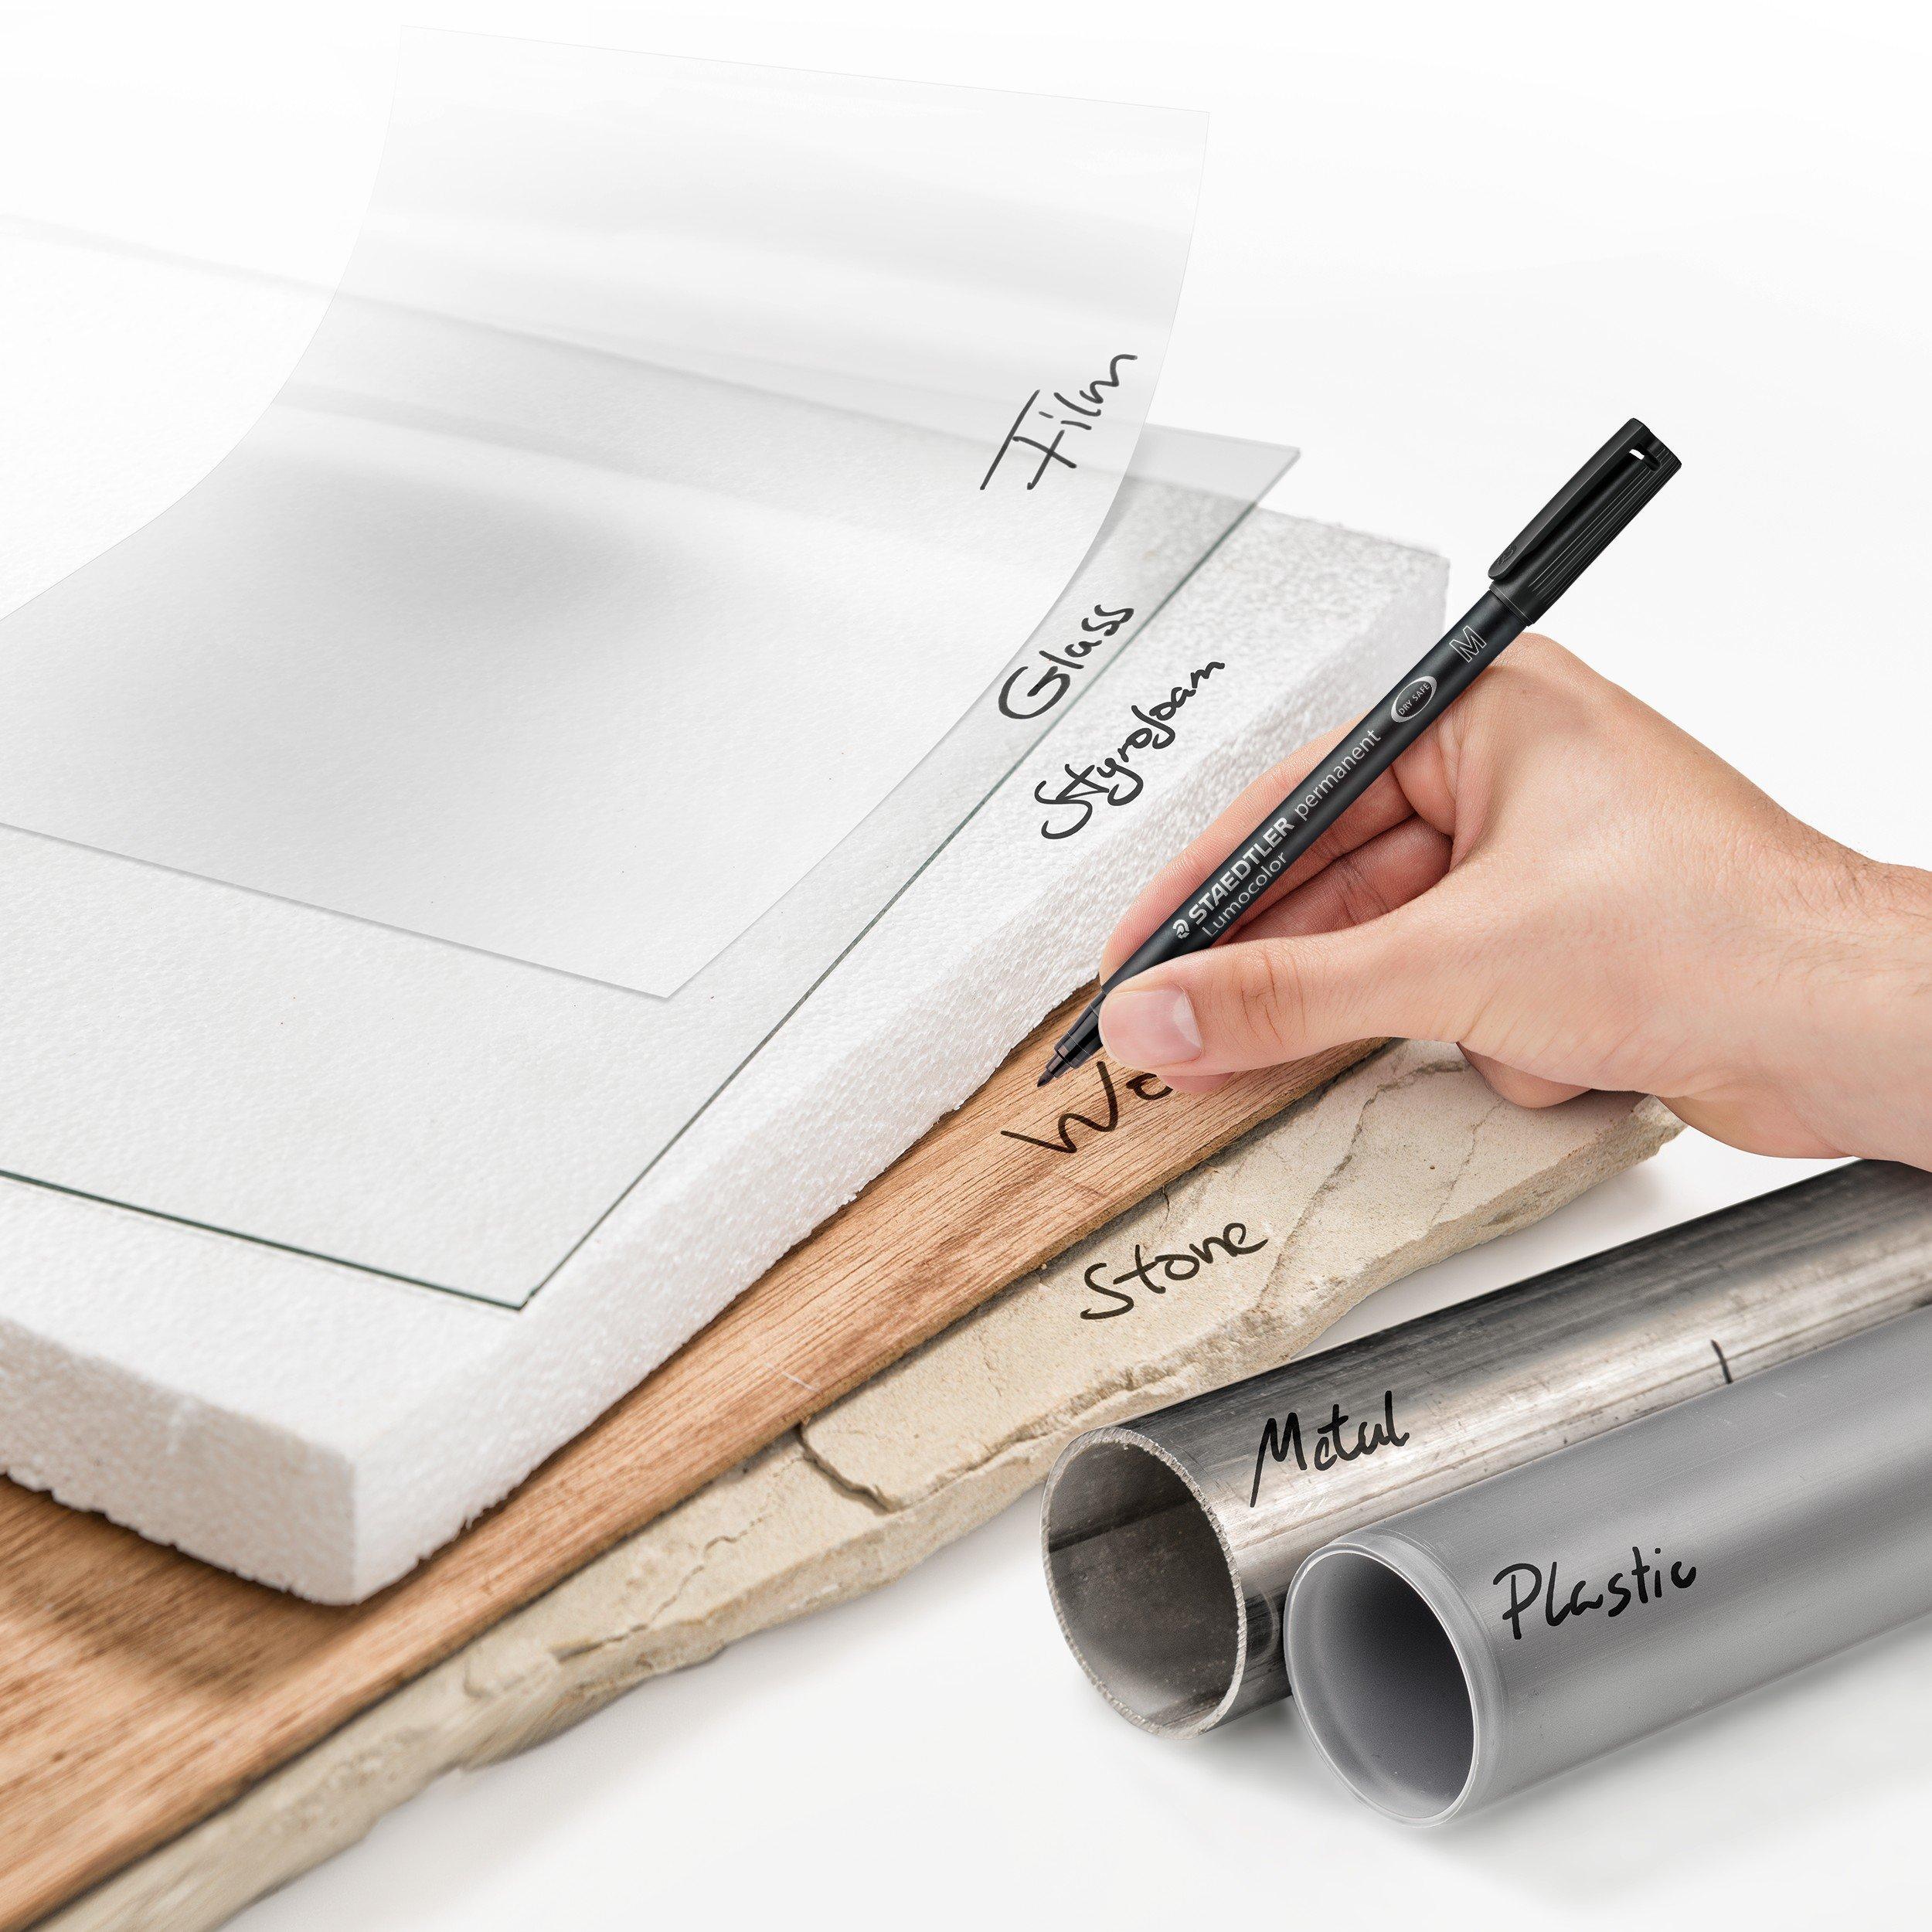 Staedtler 313 Lumocolor Universal Permanent Superfine Pens Black 0.4mm